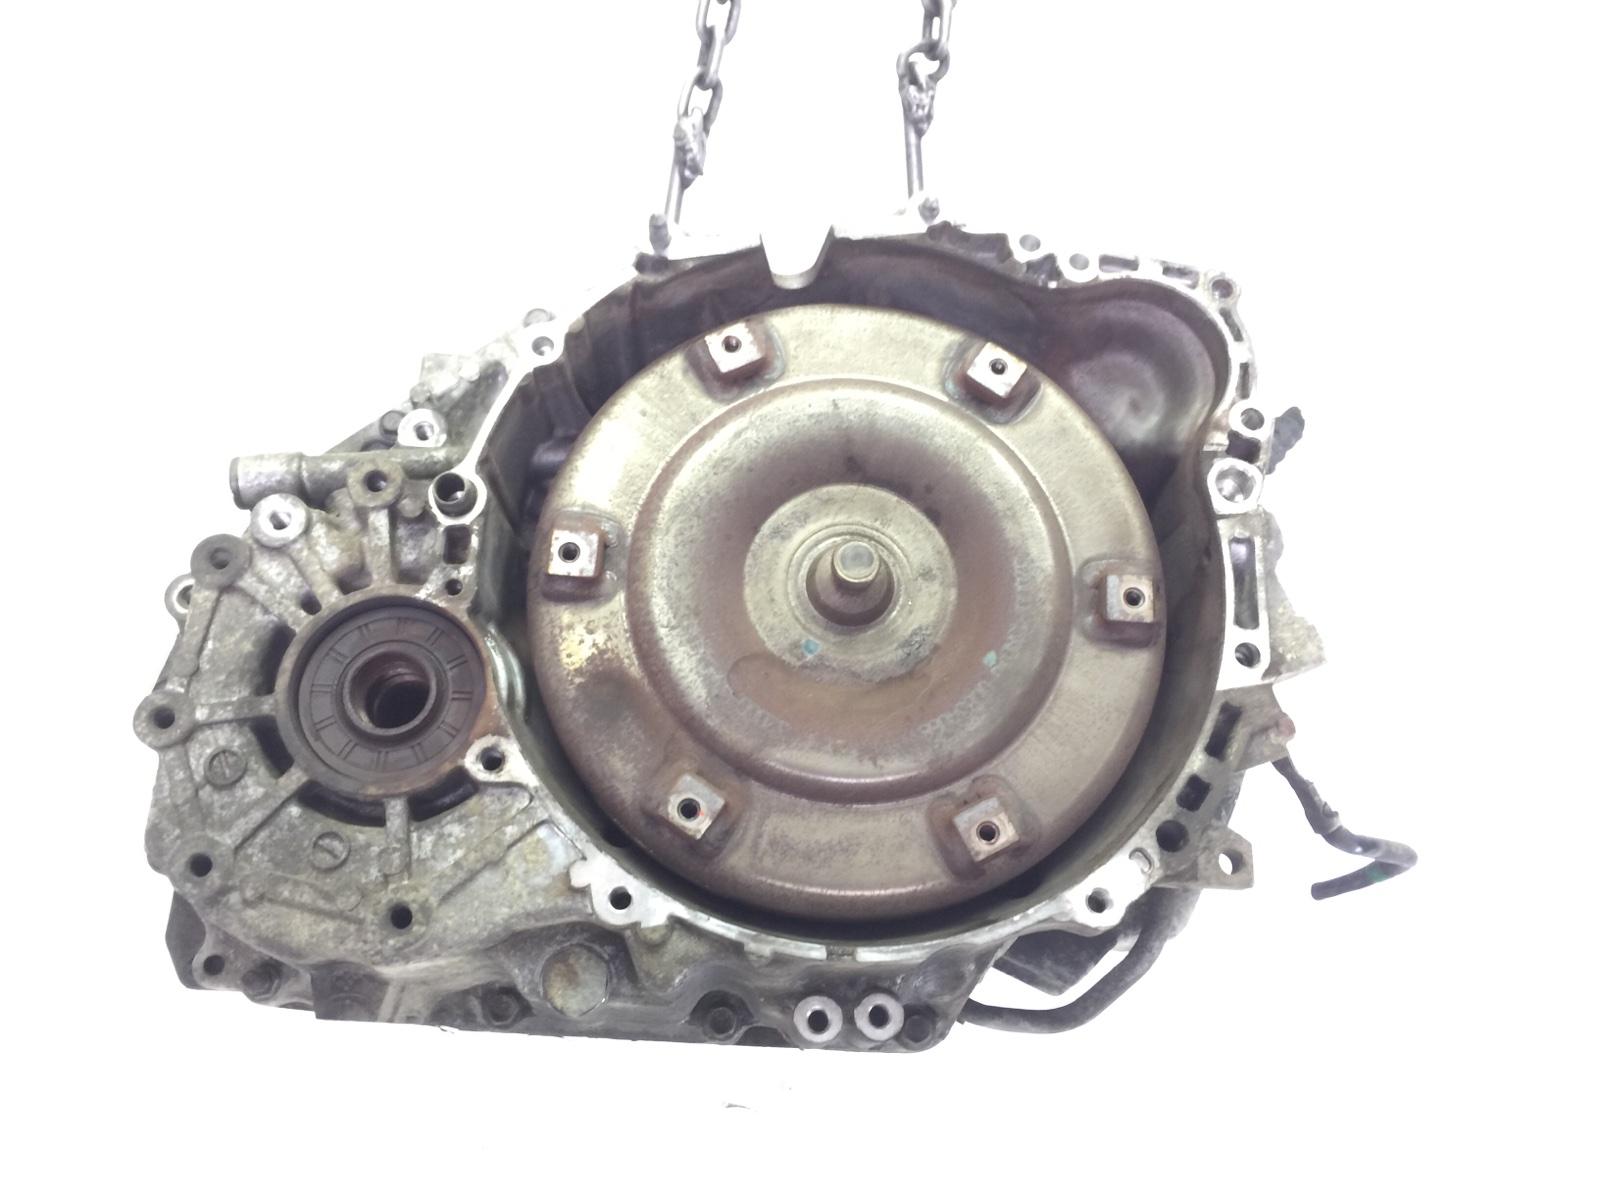 Кпп автоматическая (акпп) Volvo C70 2.4 TI 2001 (б/у)